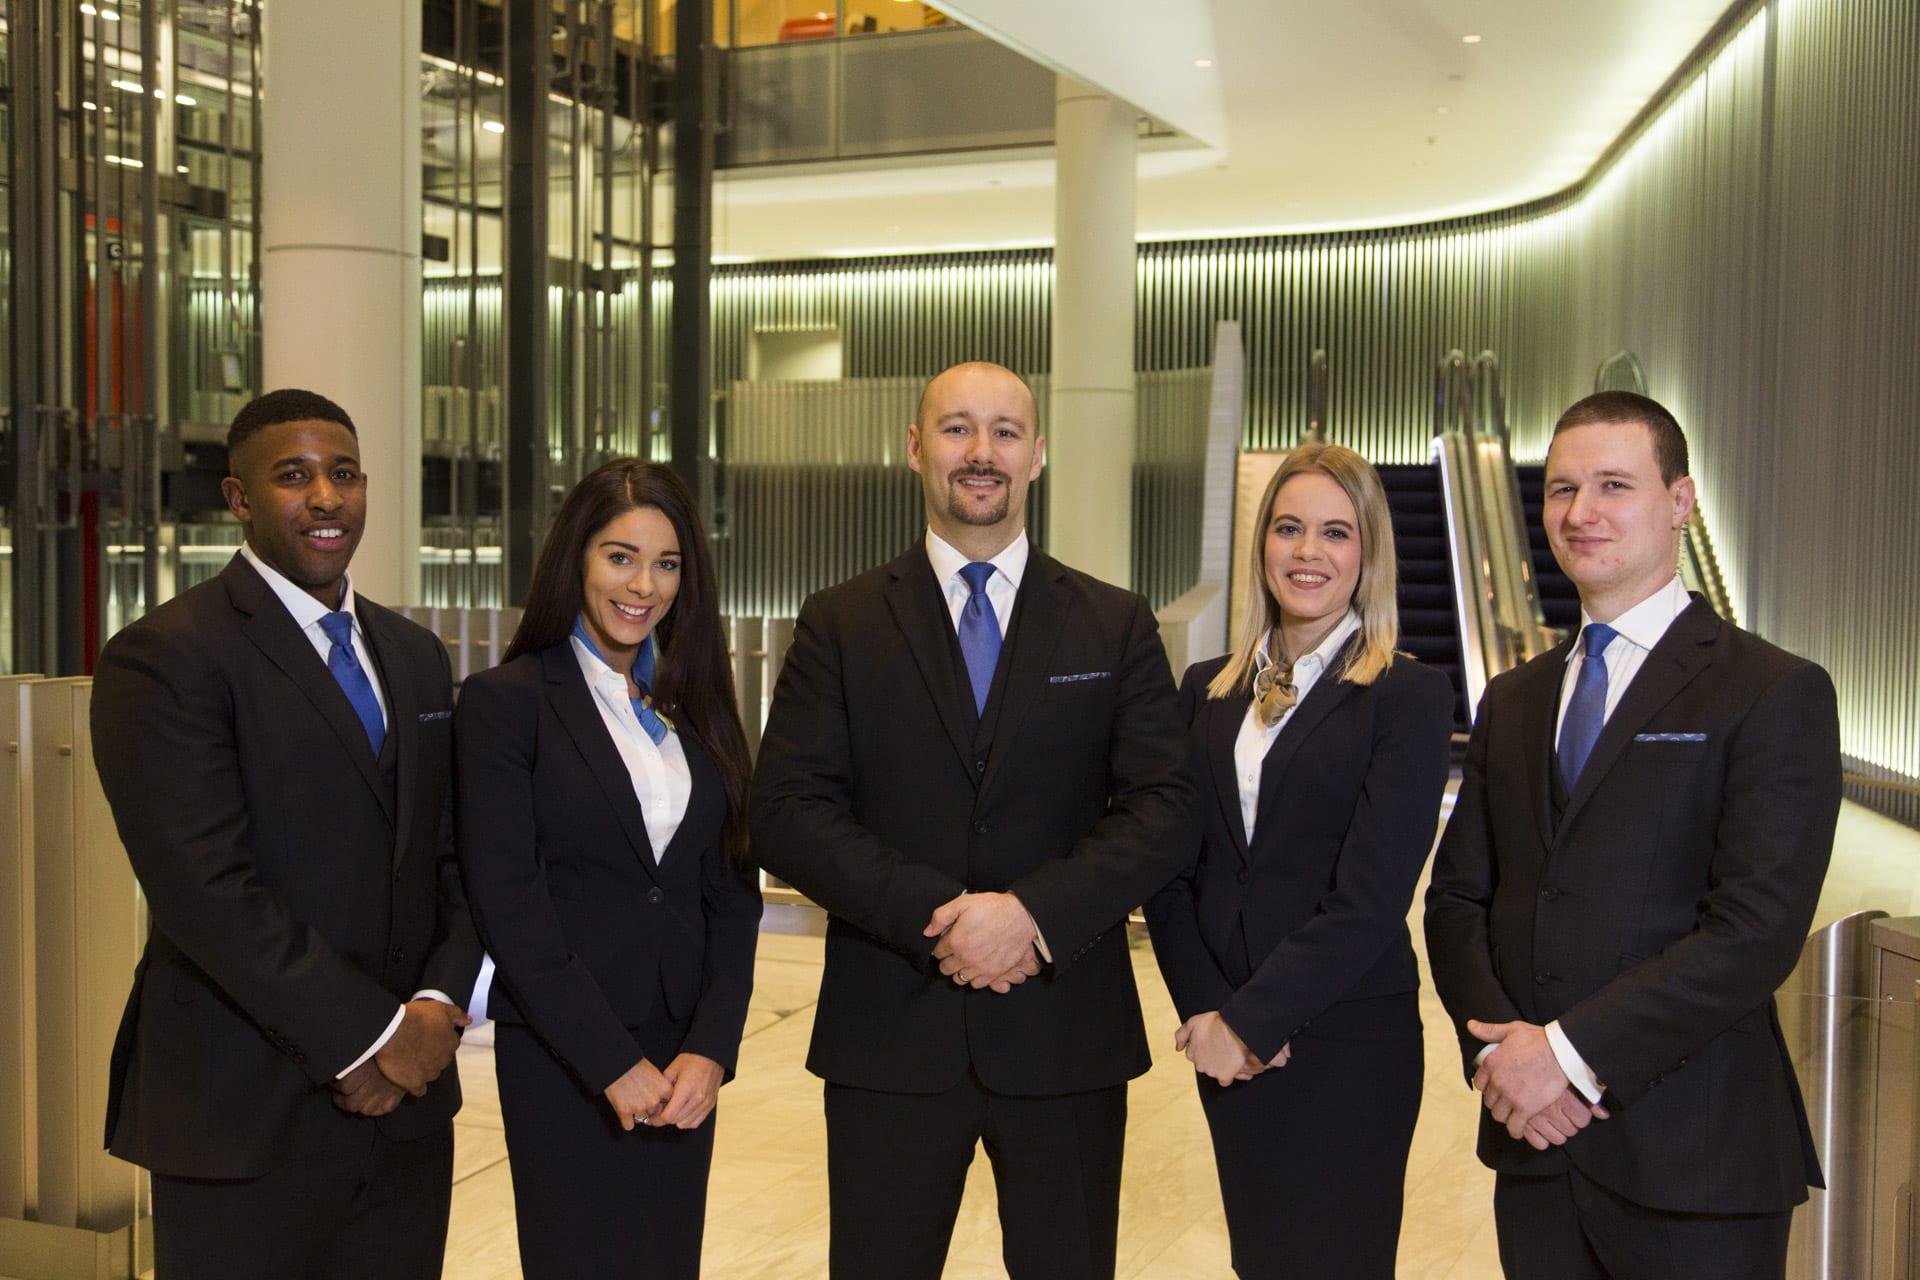 Student Life Office | Staff | Eastern Illinois University